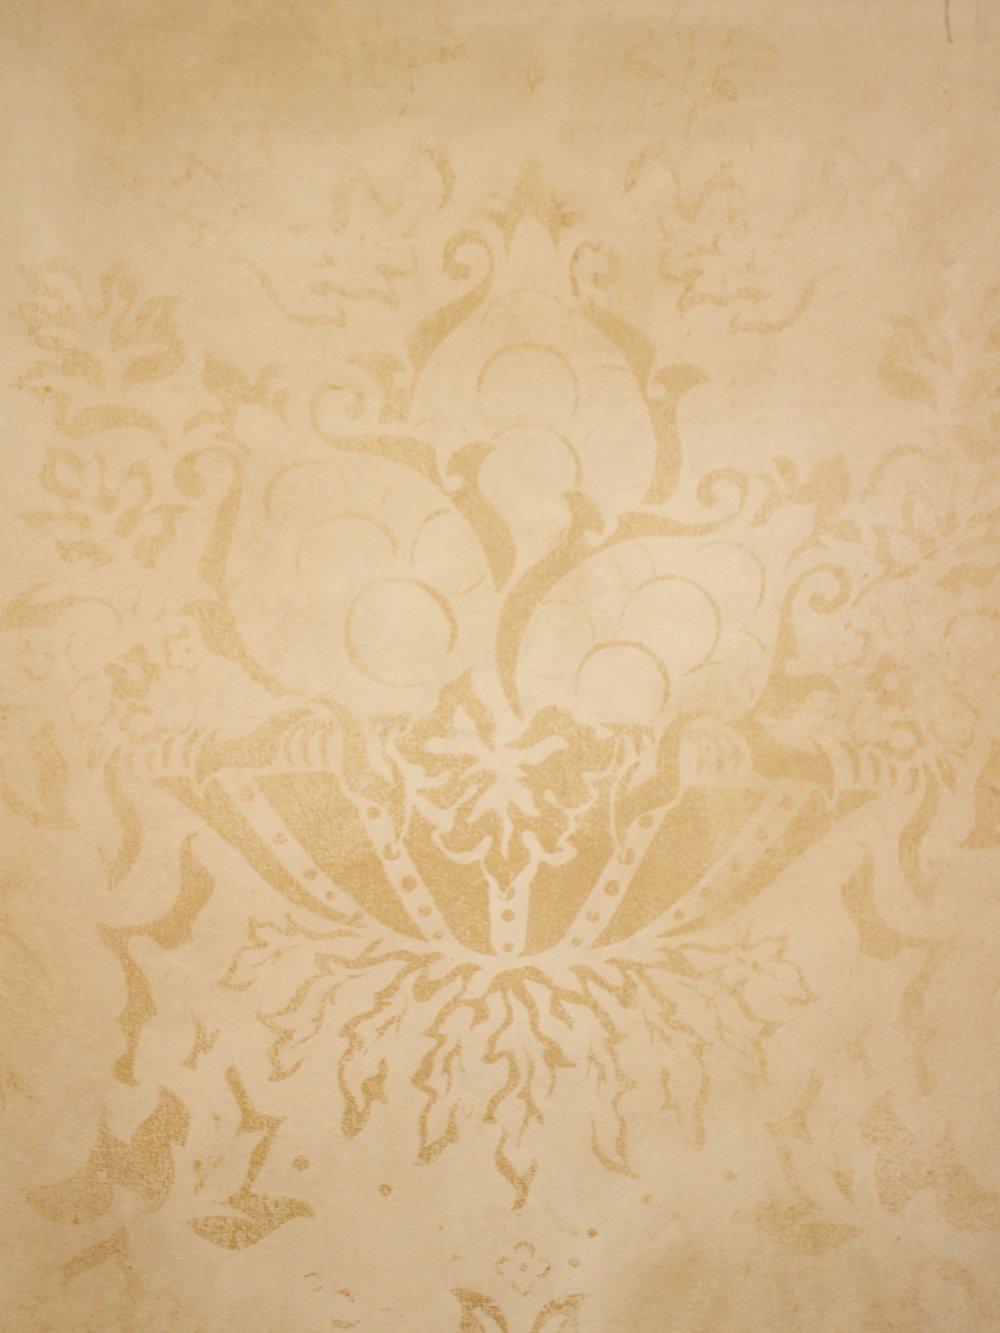 Pomme in Polished Ivory (2).jpg